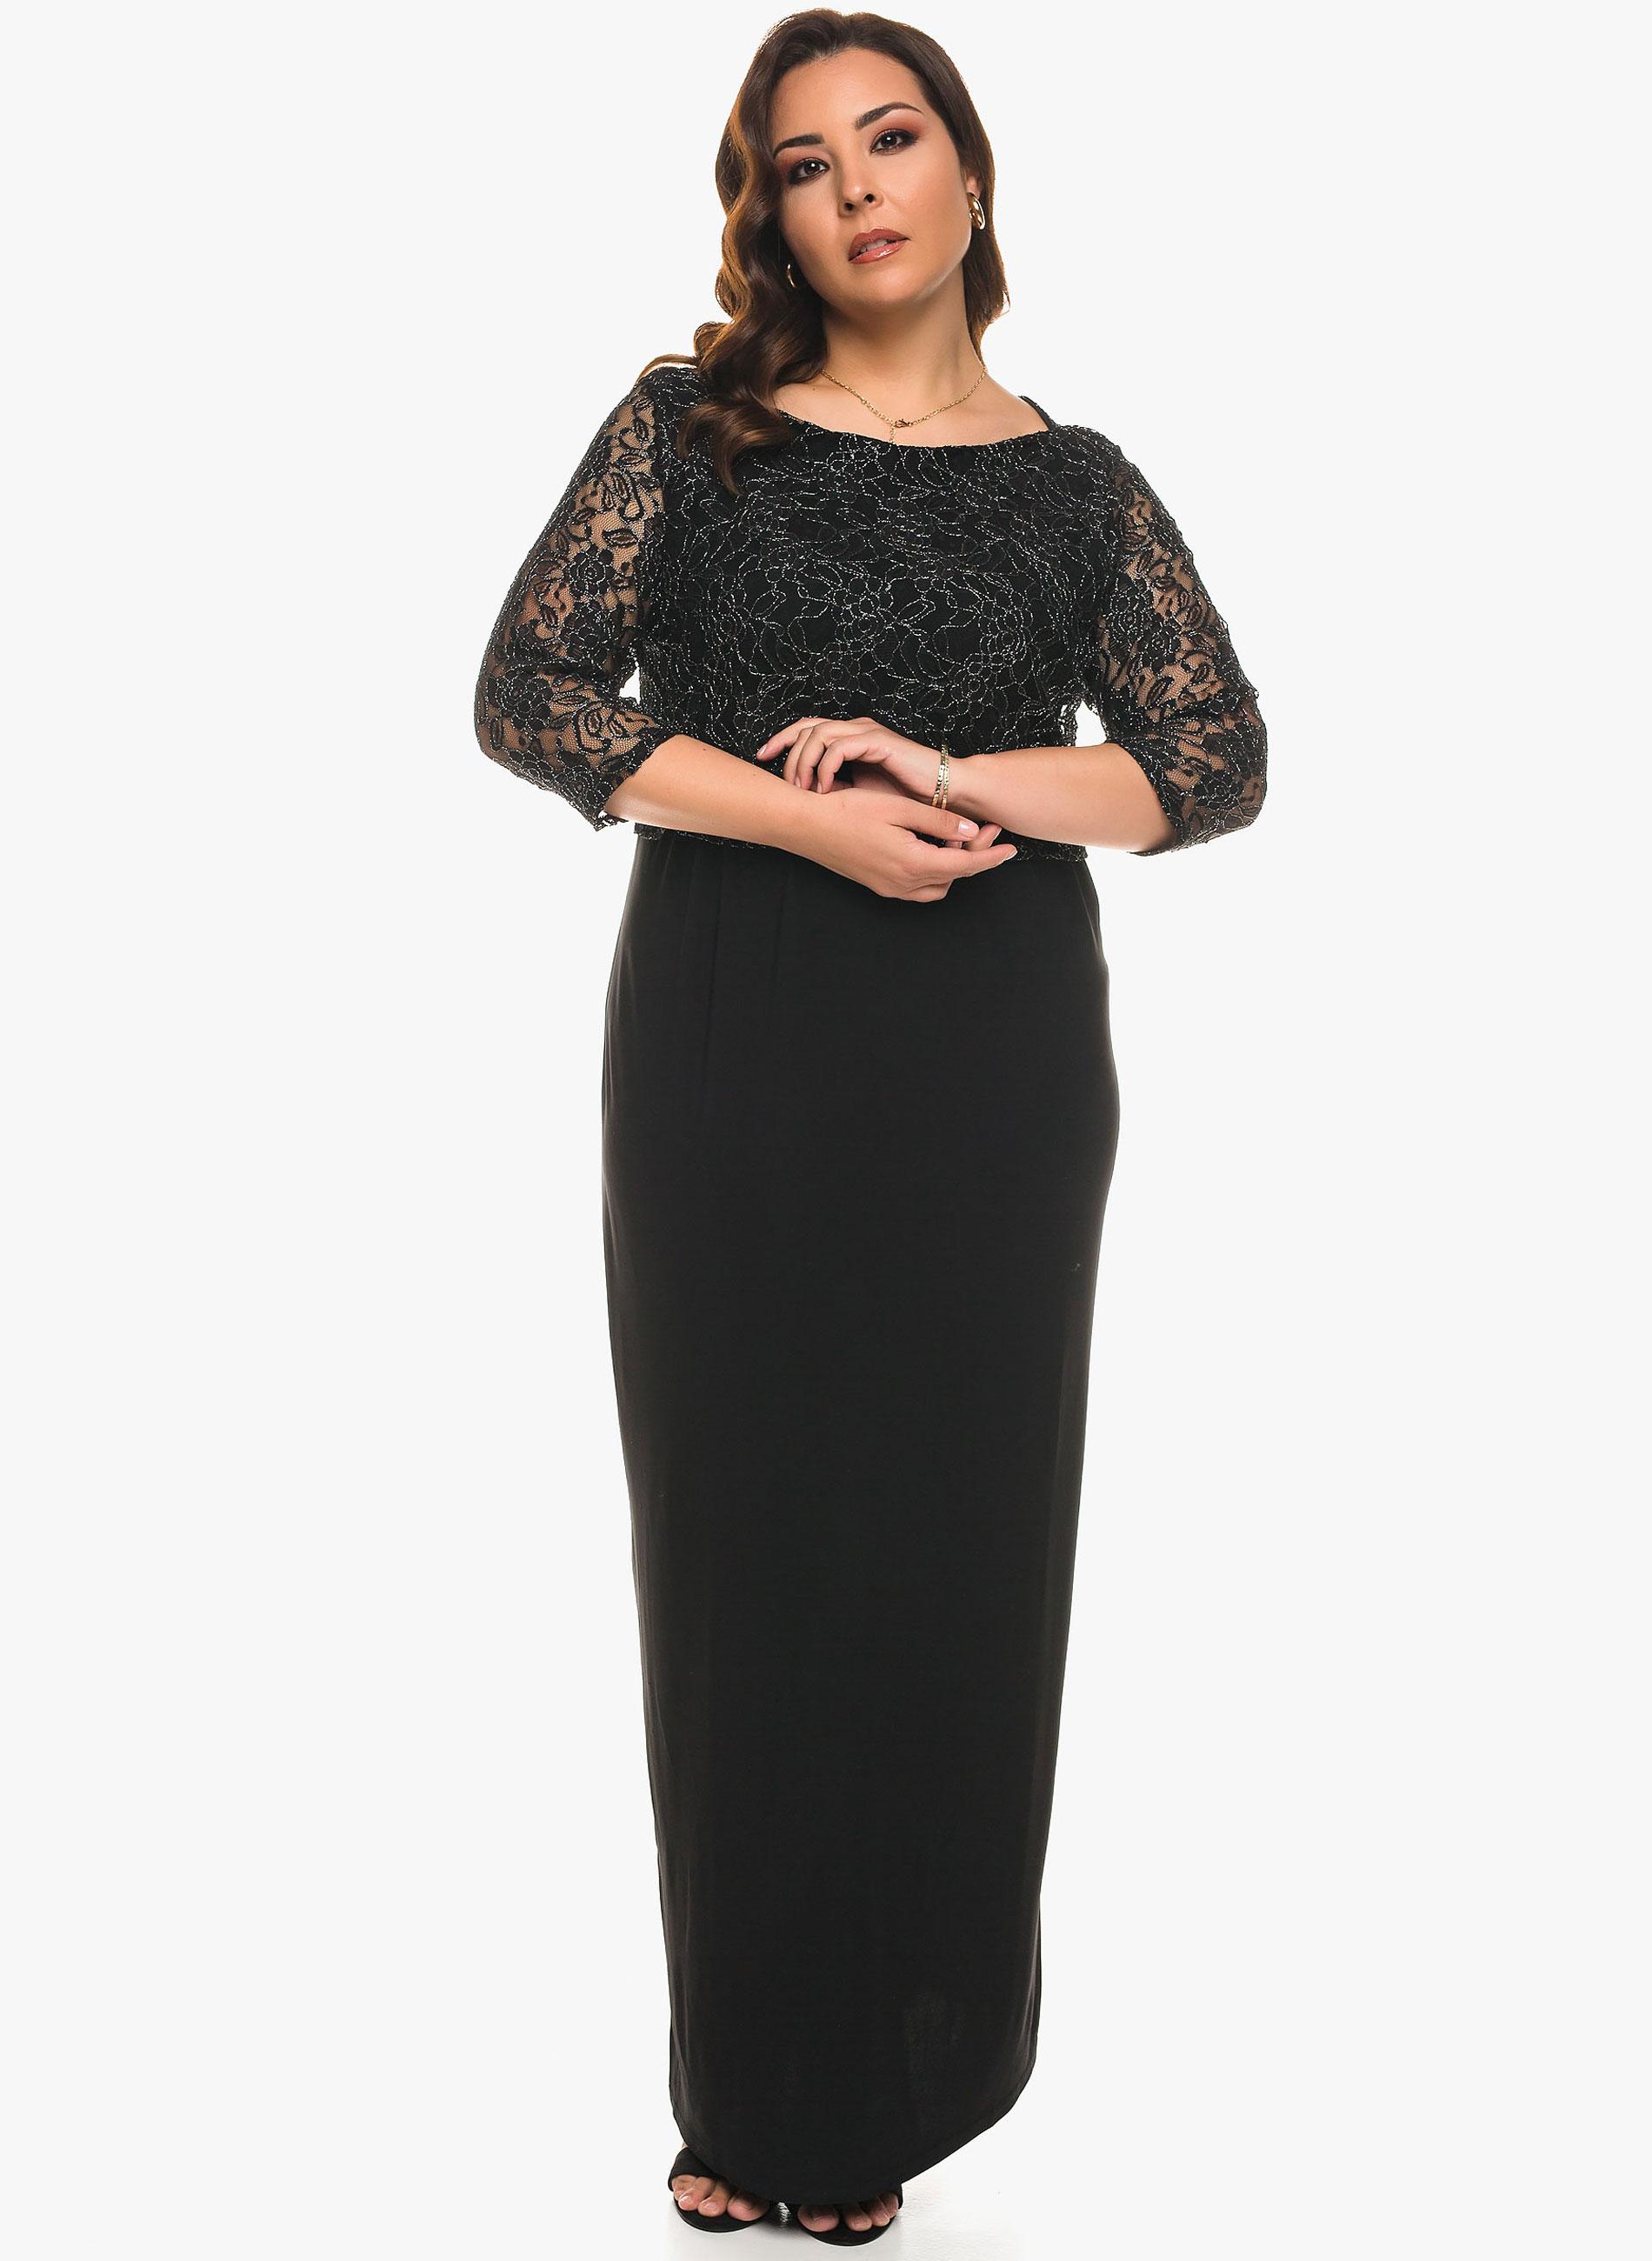 0cfa5e5bd714 ΜΕΓΑΛΑ ΜΕΓΕΘΗ ΦΟΡΕΜΑΤΑ    Μάξι Φόρεμα με Μεταλλική Δαντέλα - Μόδα σε ...